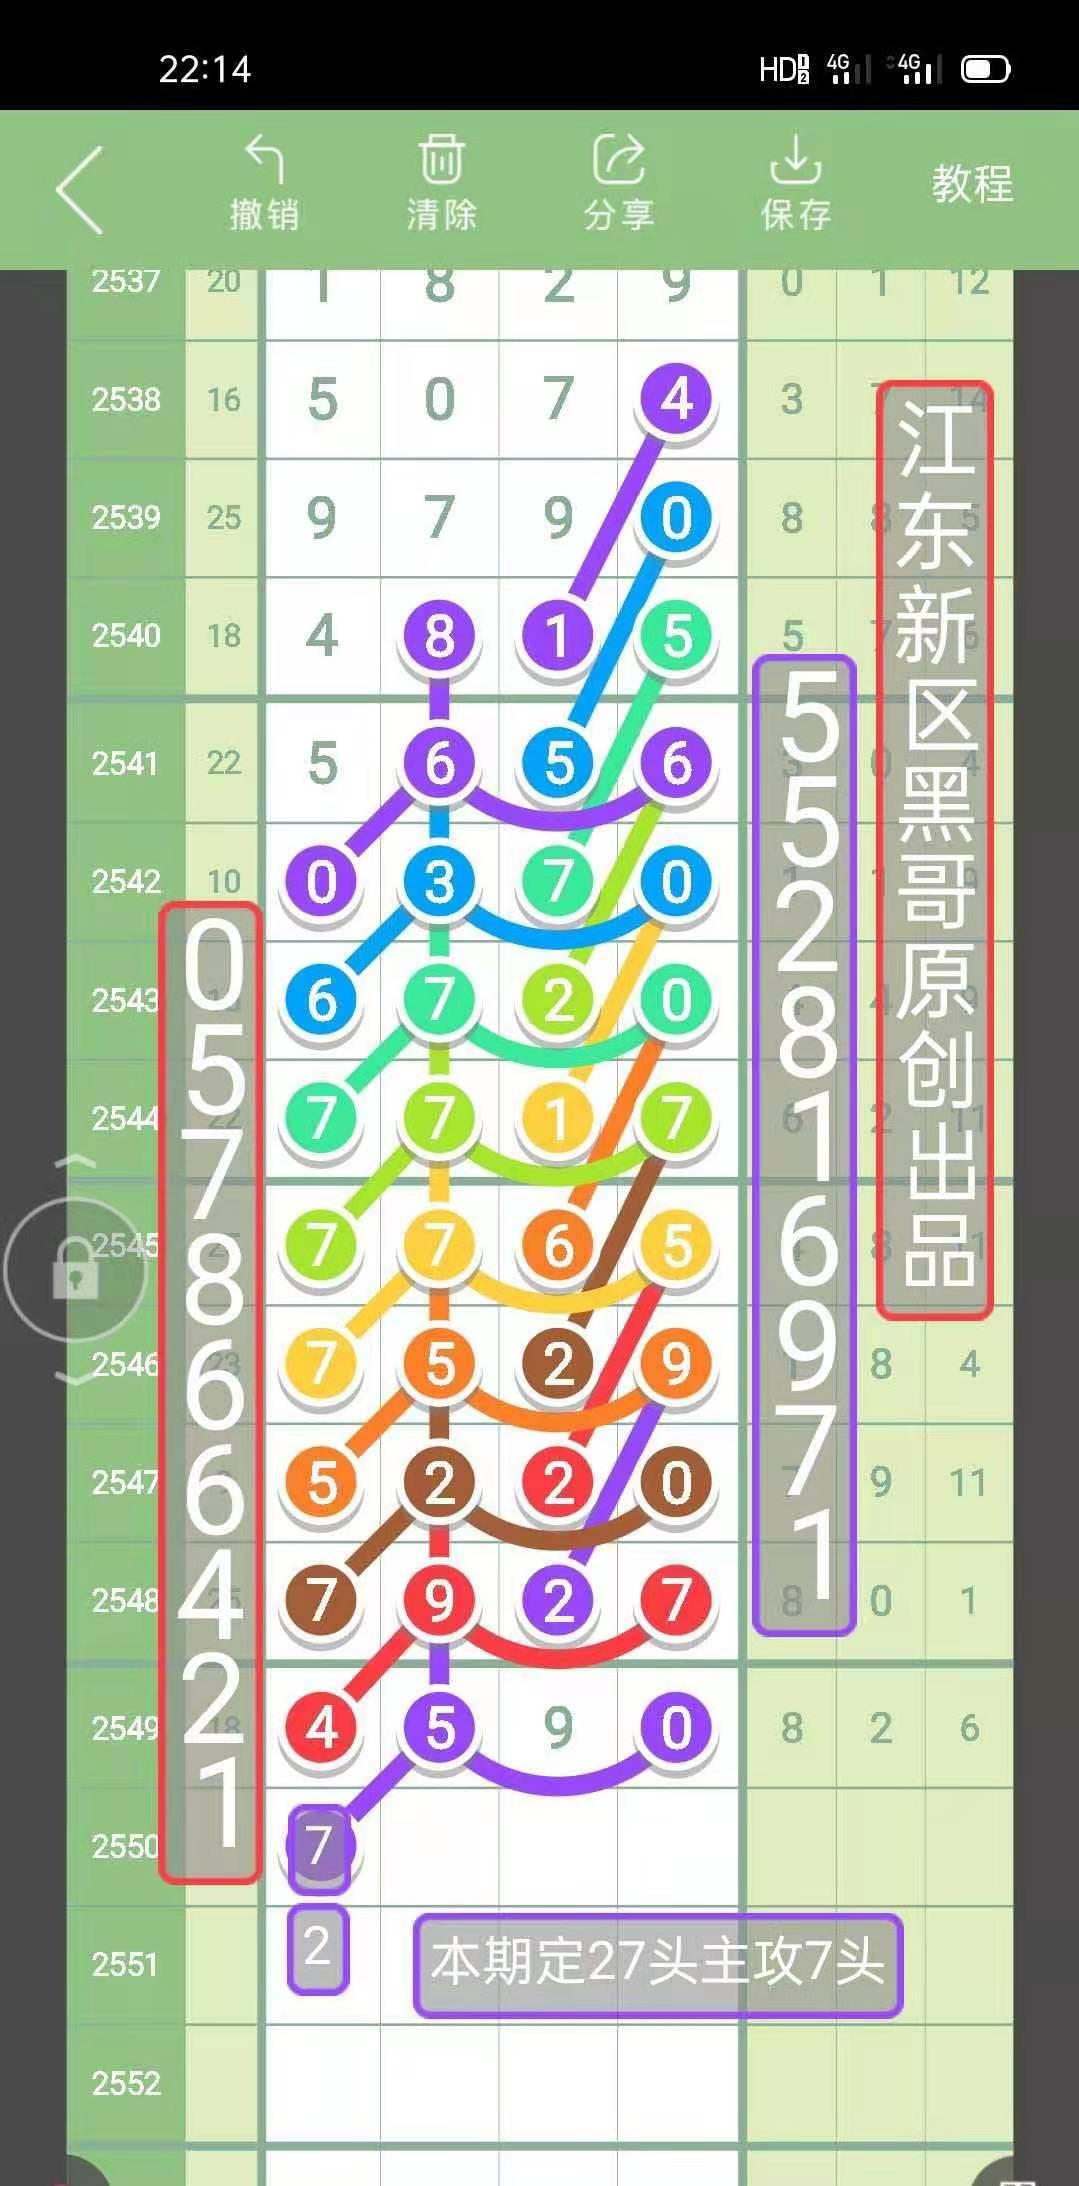 58b724d907859ccefabacde7bb18bc9.jpg